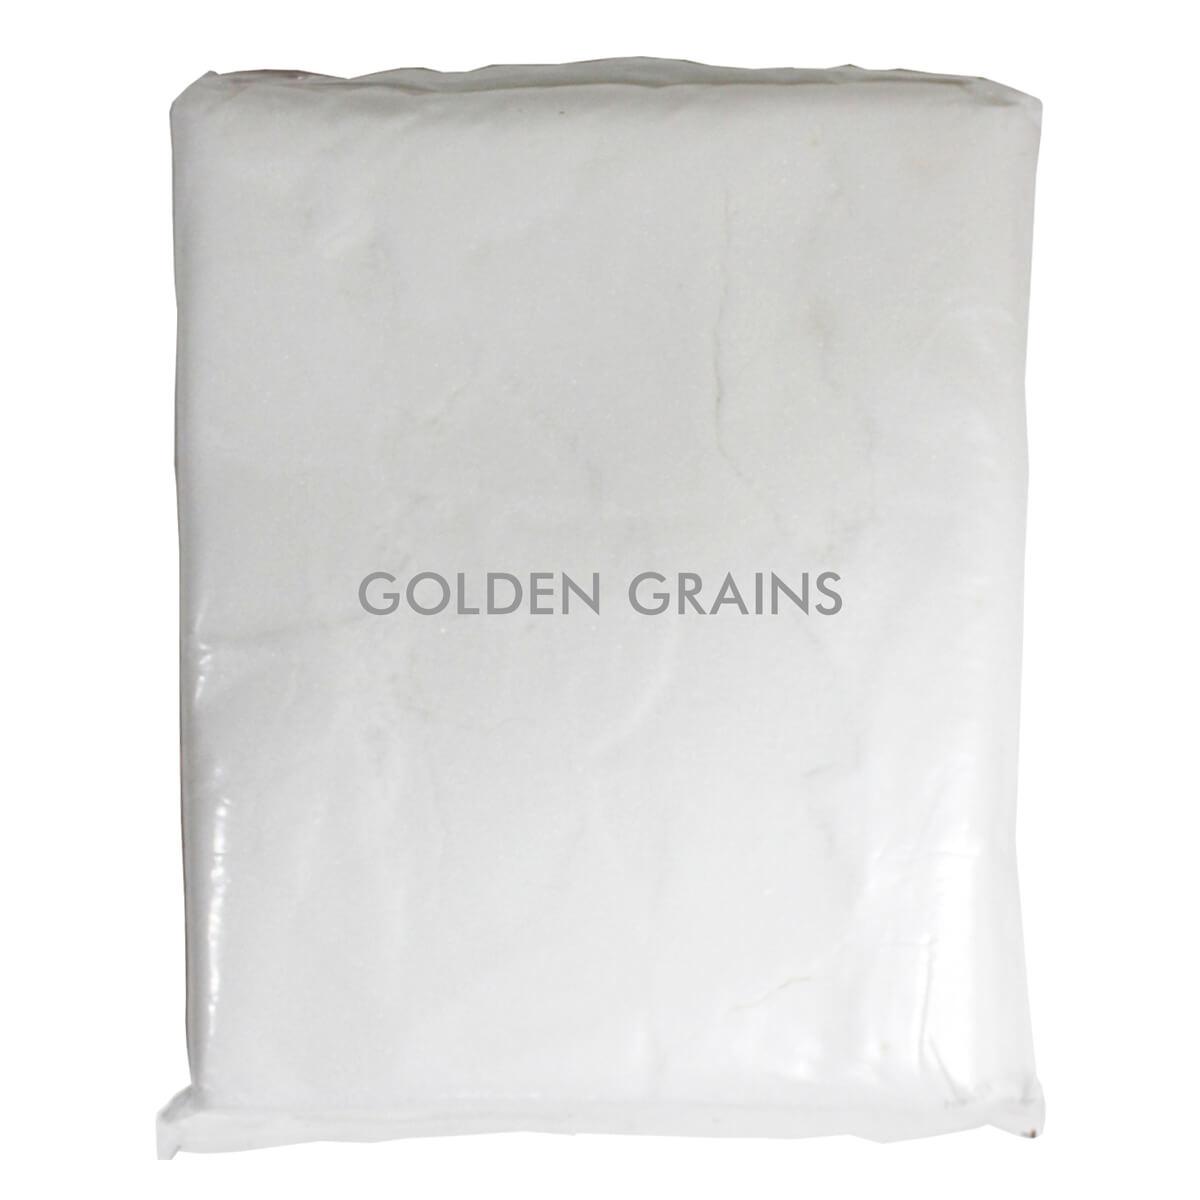 Golden Grains Mitsui - Sugar - Back.jpg